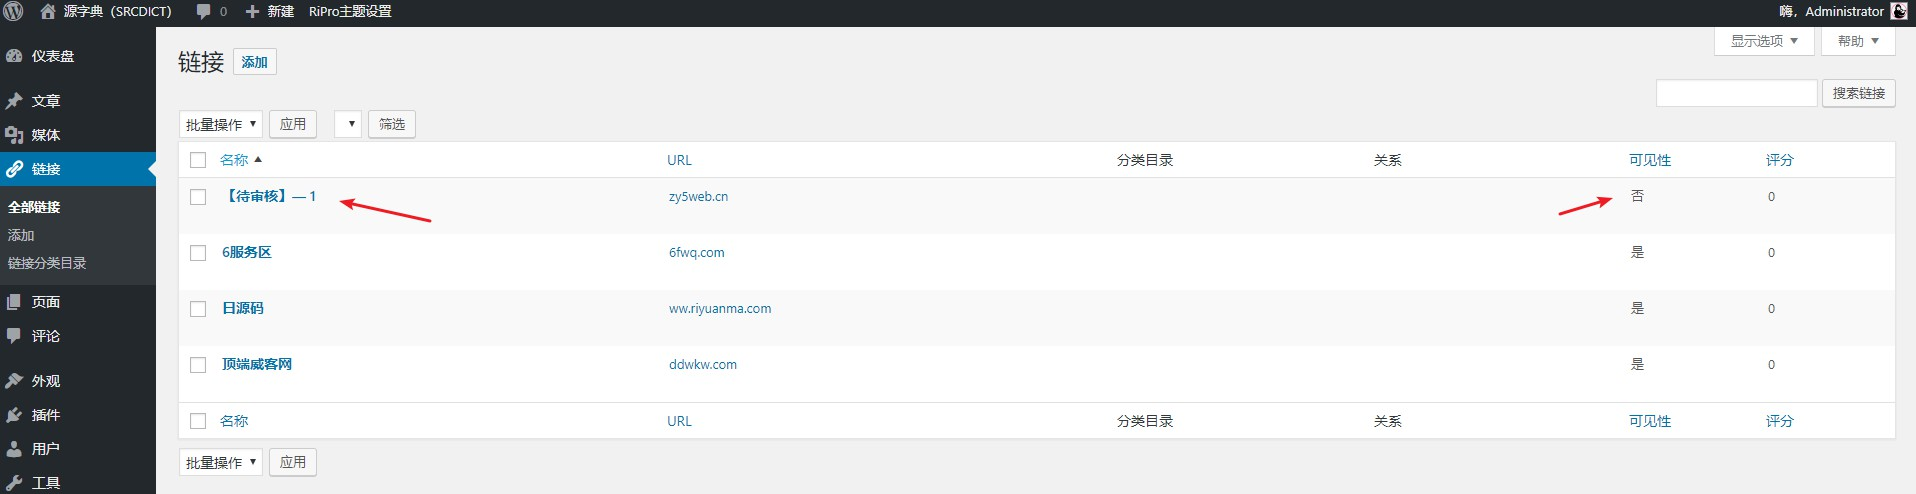 wordpress网站ripro主题纯代码添加专用友情链接+自助友情链接申请教程